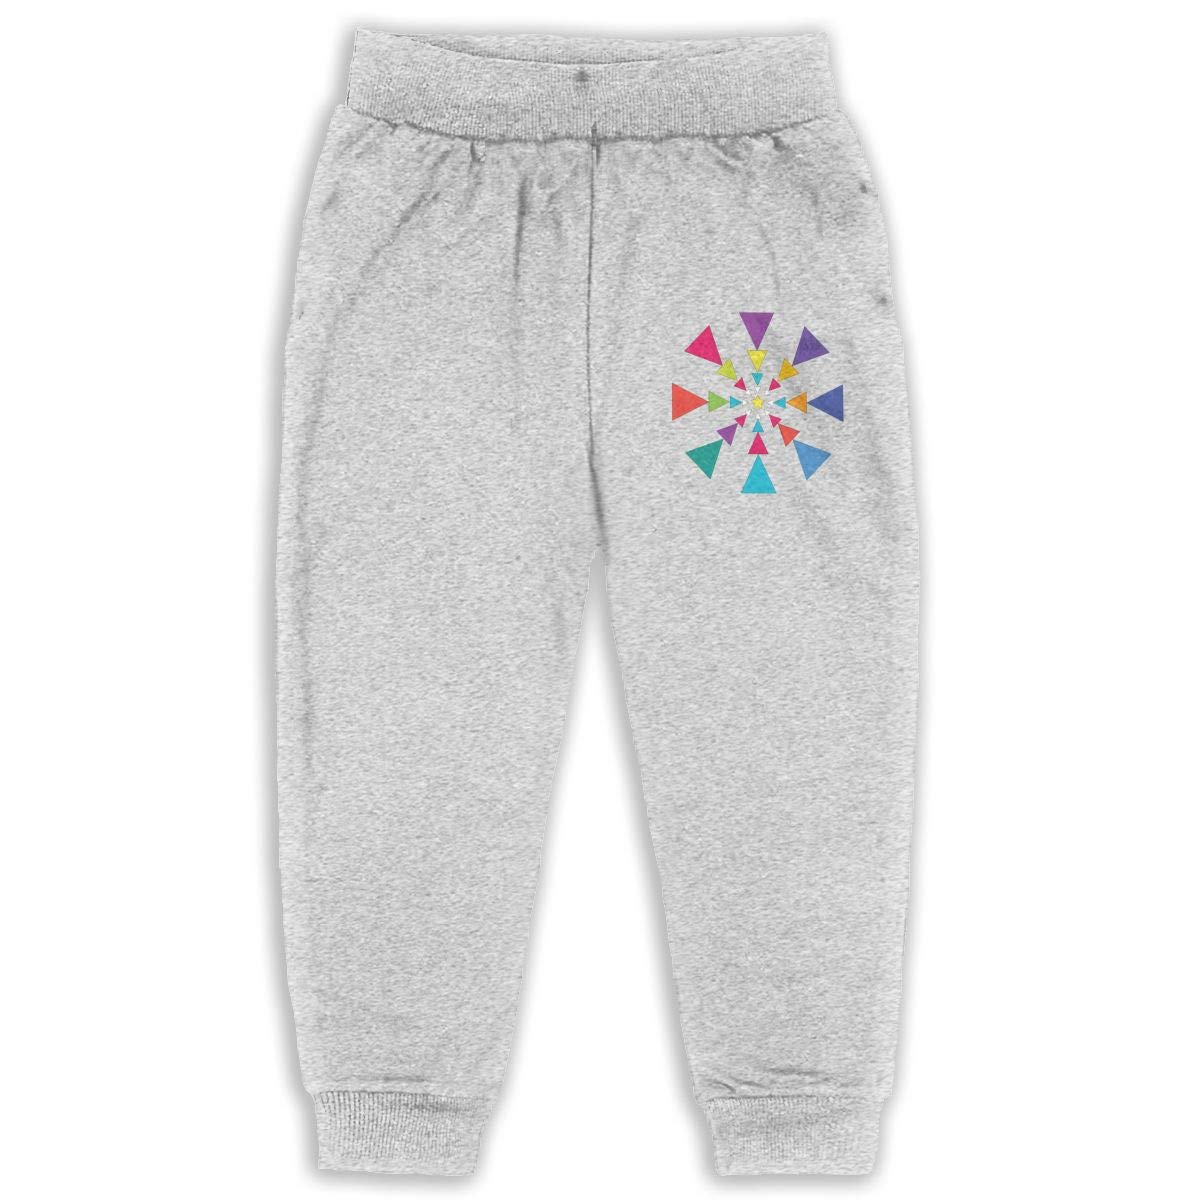 Laoyaotequ Triangle Dance Kids Cotton Sweatpants,Jogger Long Jersey Sweatpants